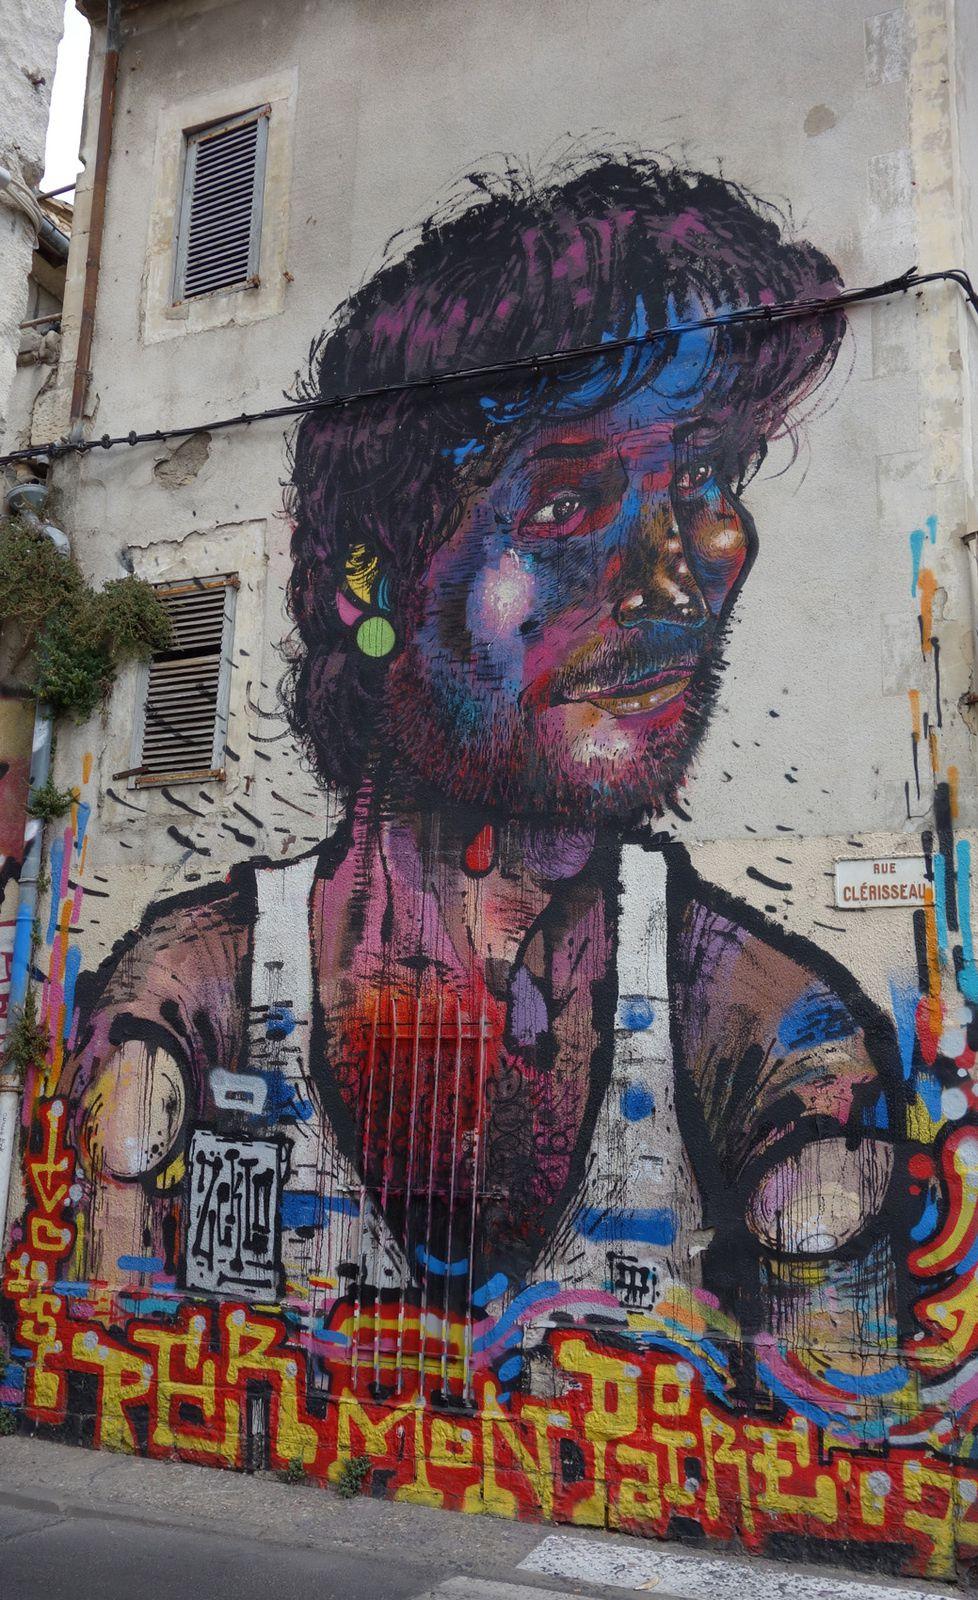 Street Art : Graffitis & Fresques Murales 30189 Nîmes